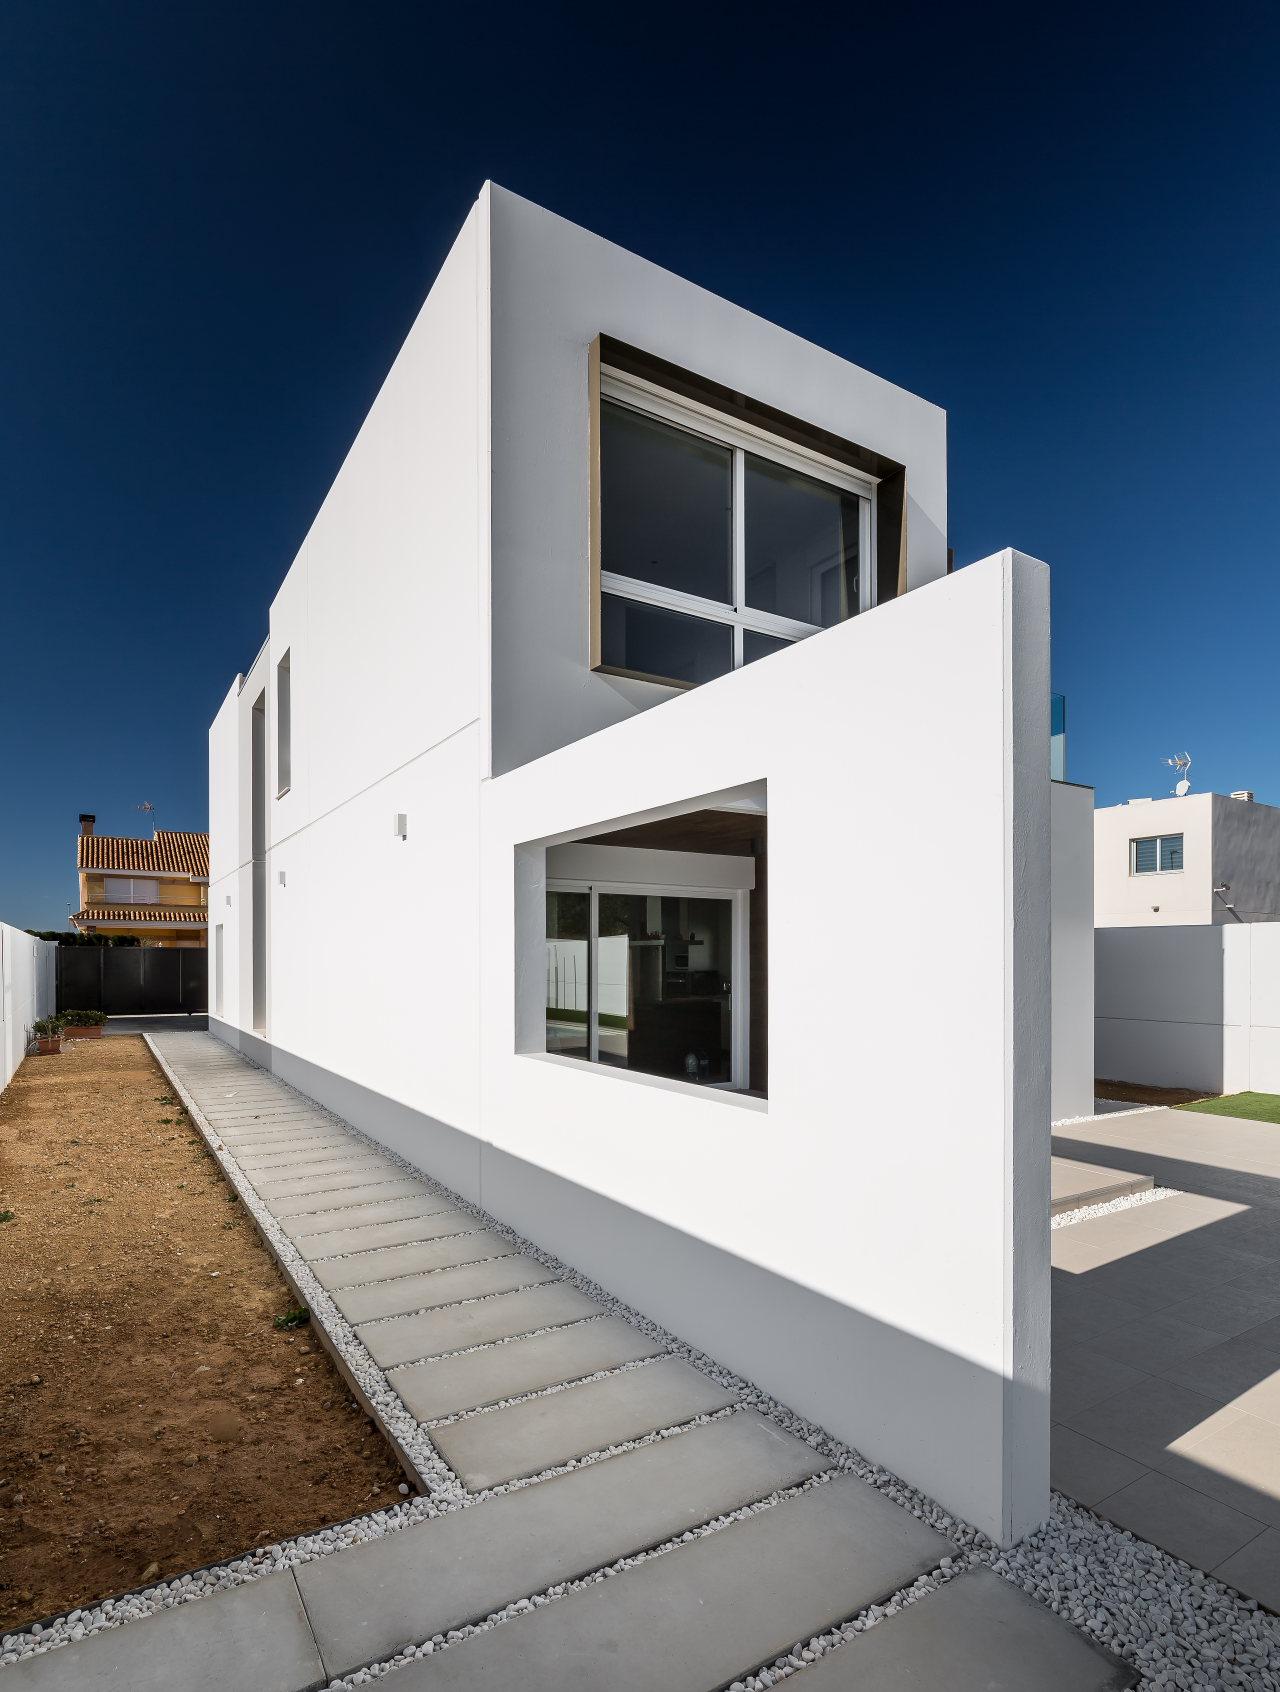 fotografia-arquitectura-valencia-german-cabo-viraje-san-antonio (5)